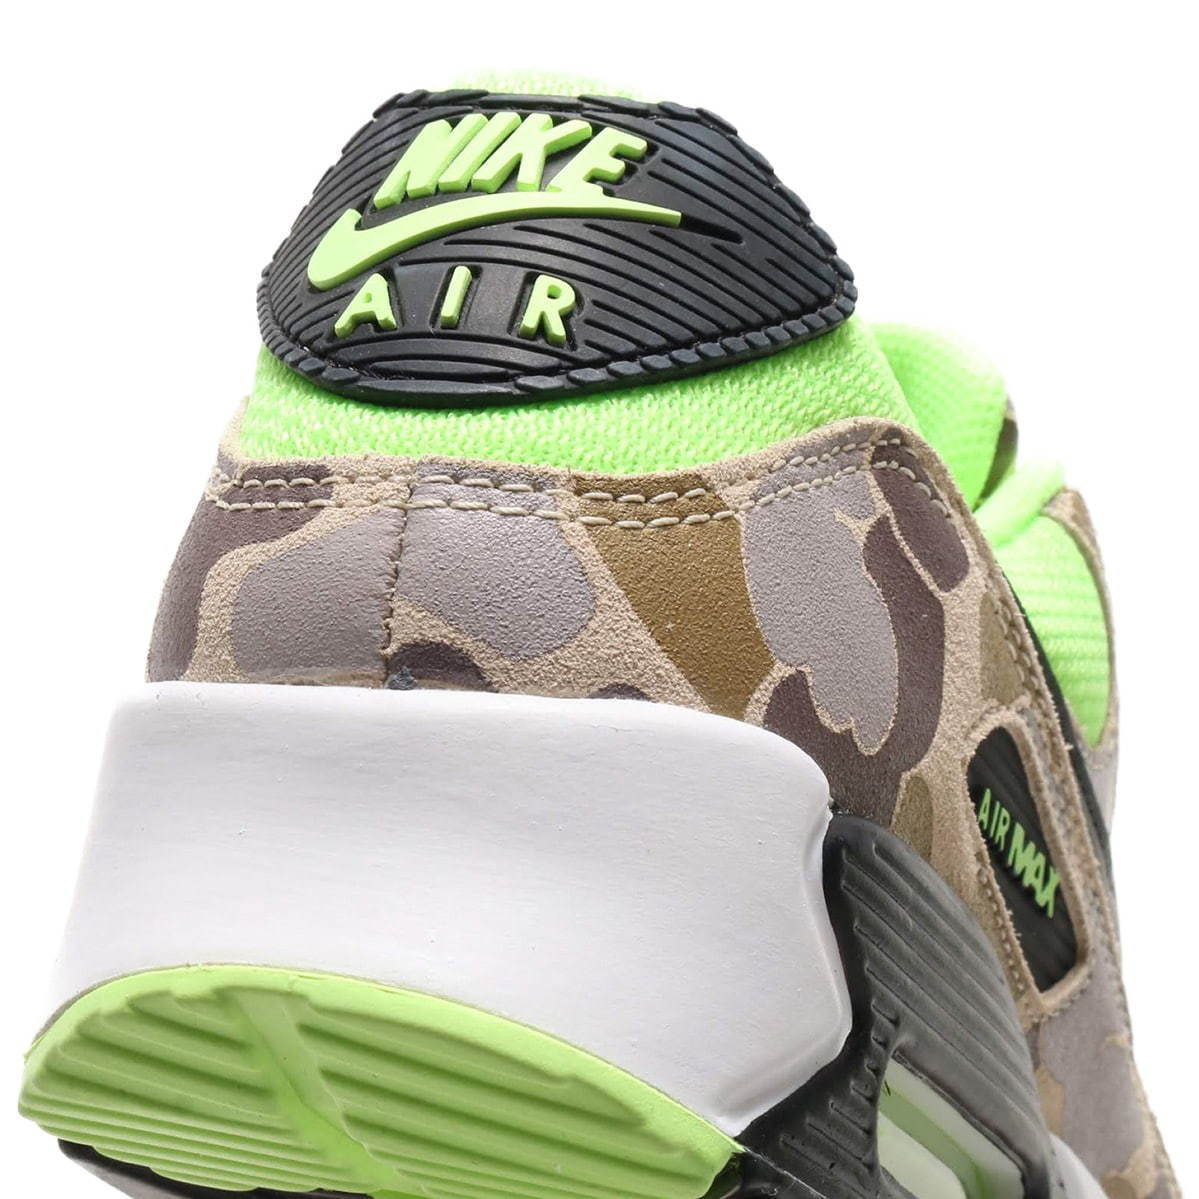 NIKE AIR MAX 90 GREEN CAMO ナイキ エアマックス90 グリーンカモ CW4039-300